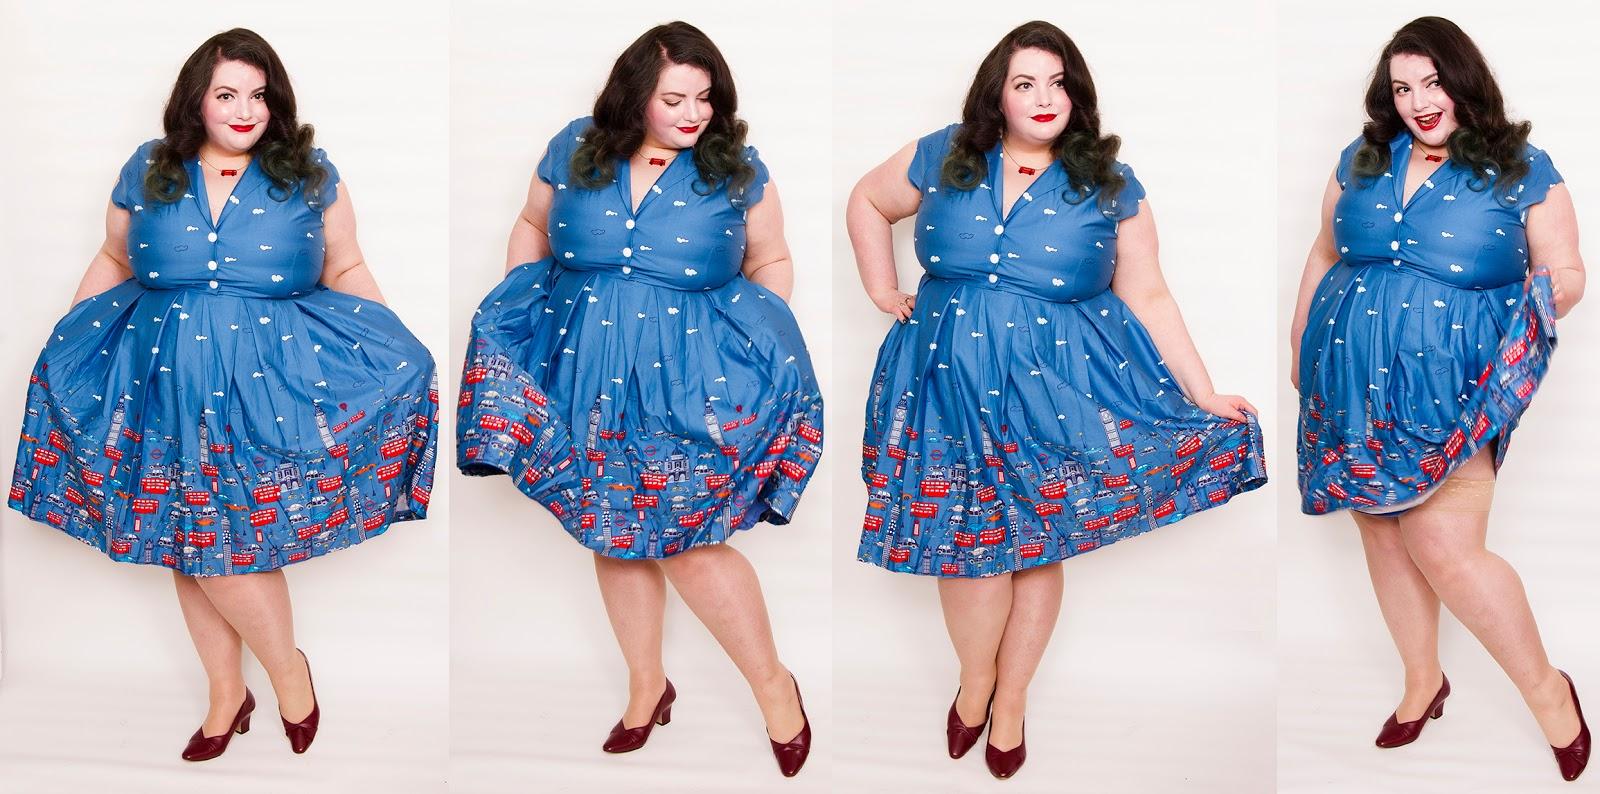 29f7a85c2f293 Dress: Gilda London Traffic Jam Print Swing Dress from Lindy Bop (£36)